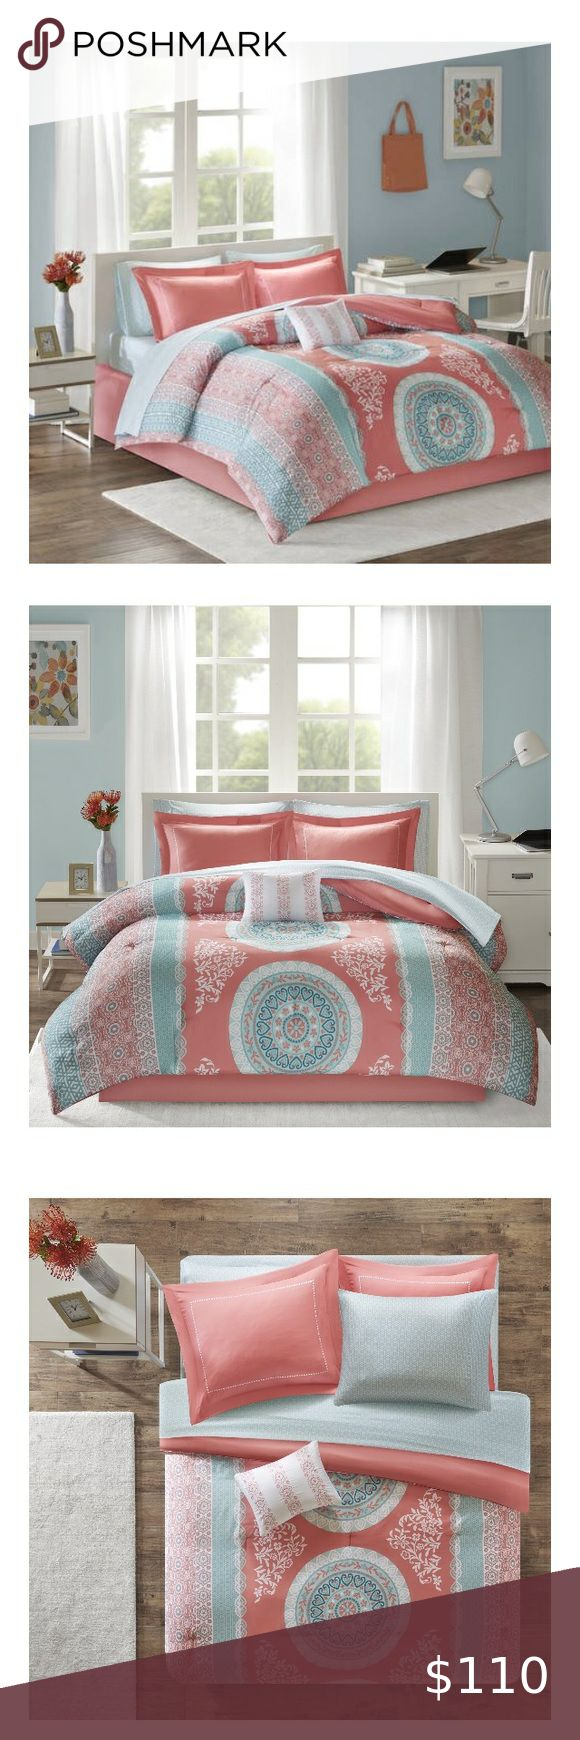 Coral Bed in a Bag Comforter Bedding Set, Queen in 2020